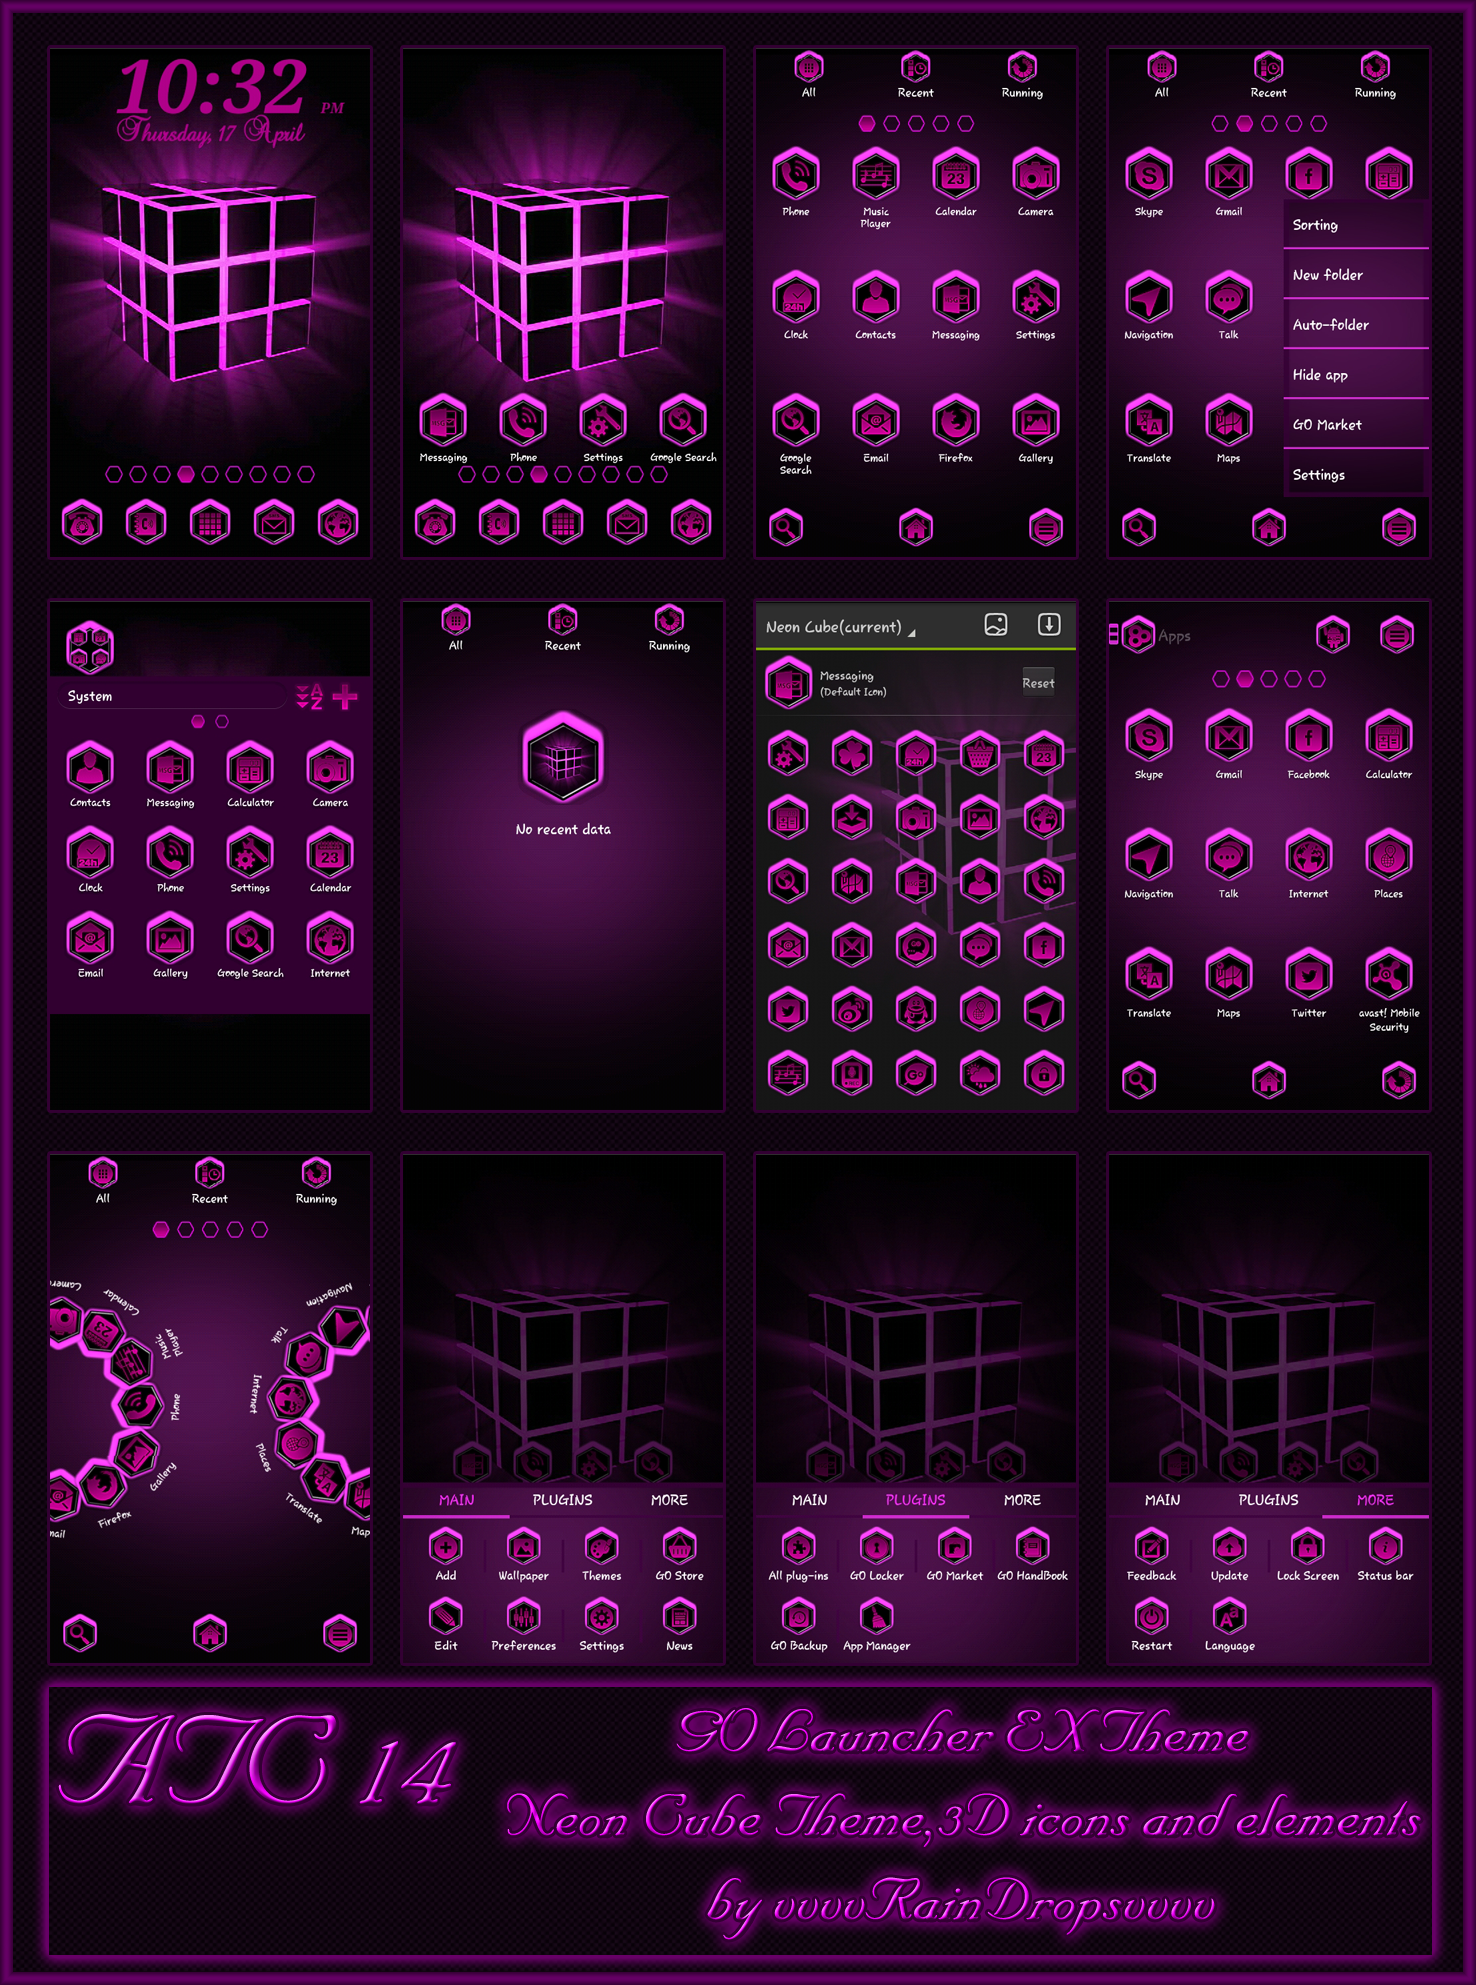 Google themes mobile9 - Purple Neon Lights Rubik S Cube Go Launcher Ex Themes Mobile9